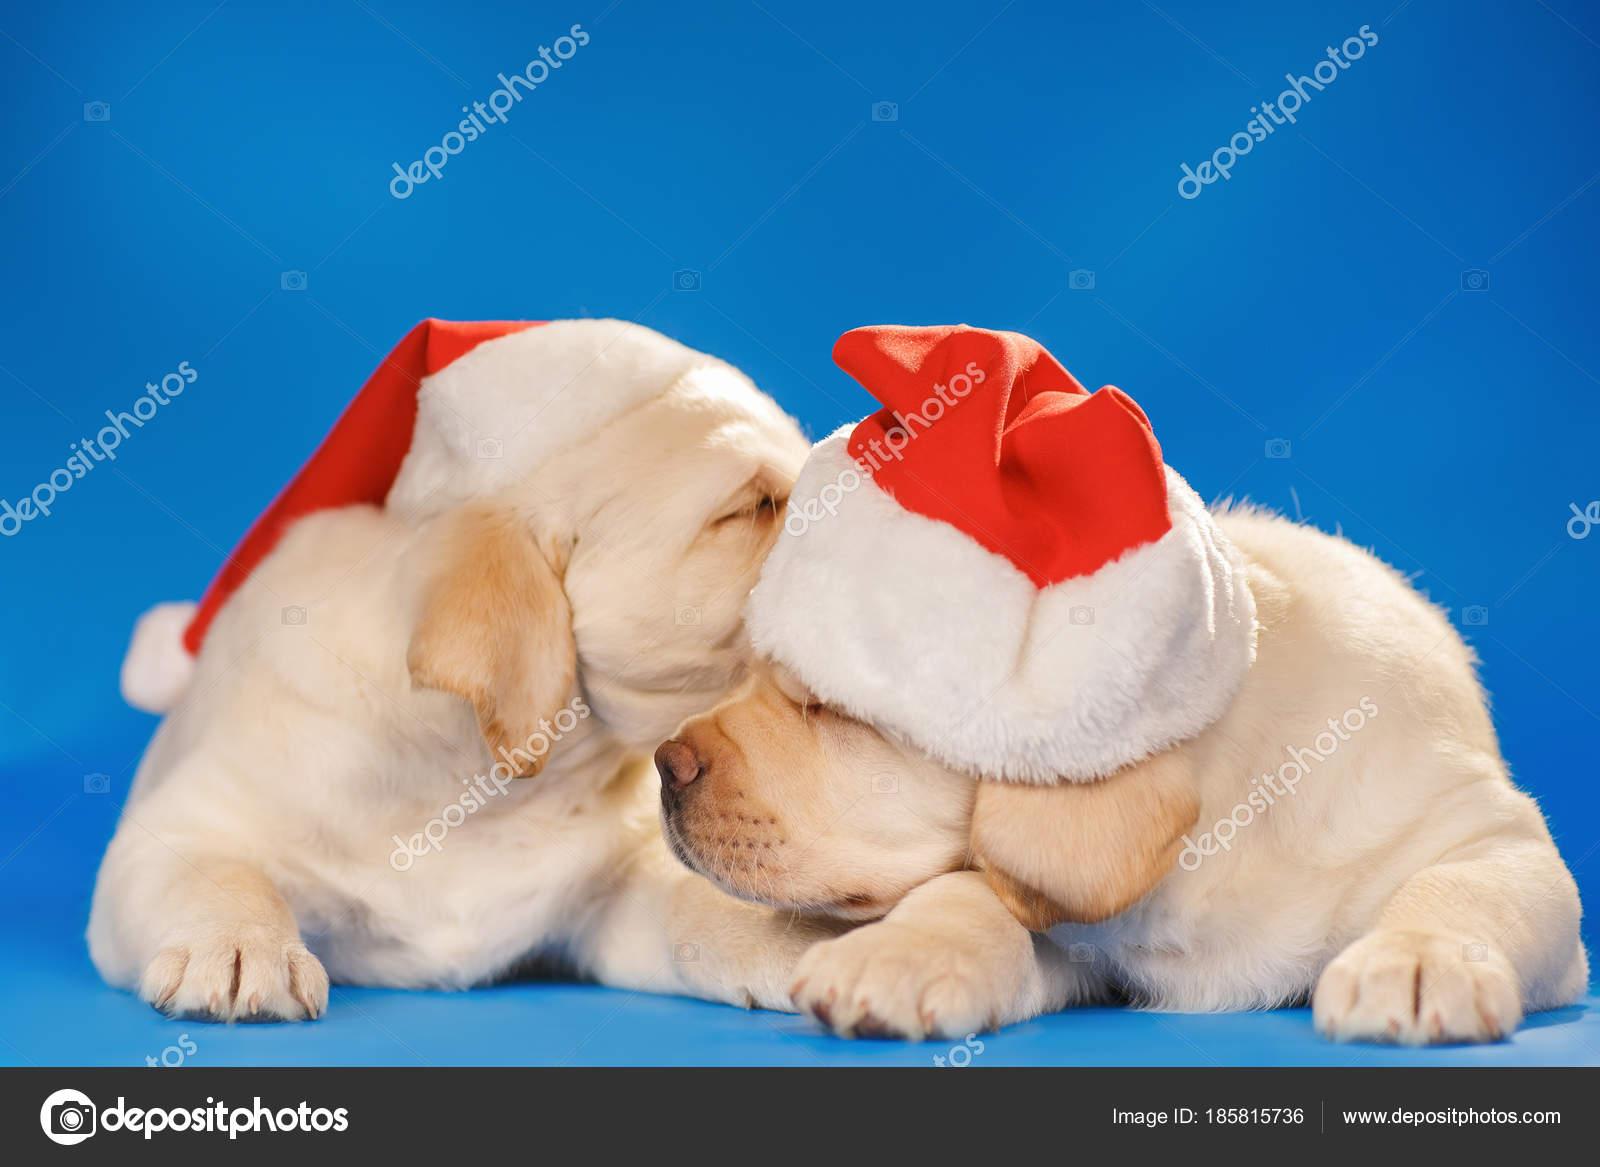 Labrador Puppies In Santa Hat On A Blue Background Stock Photo C Chirtsova 185815736